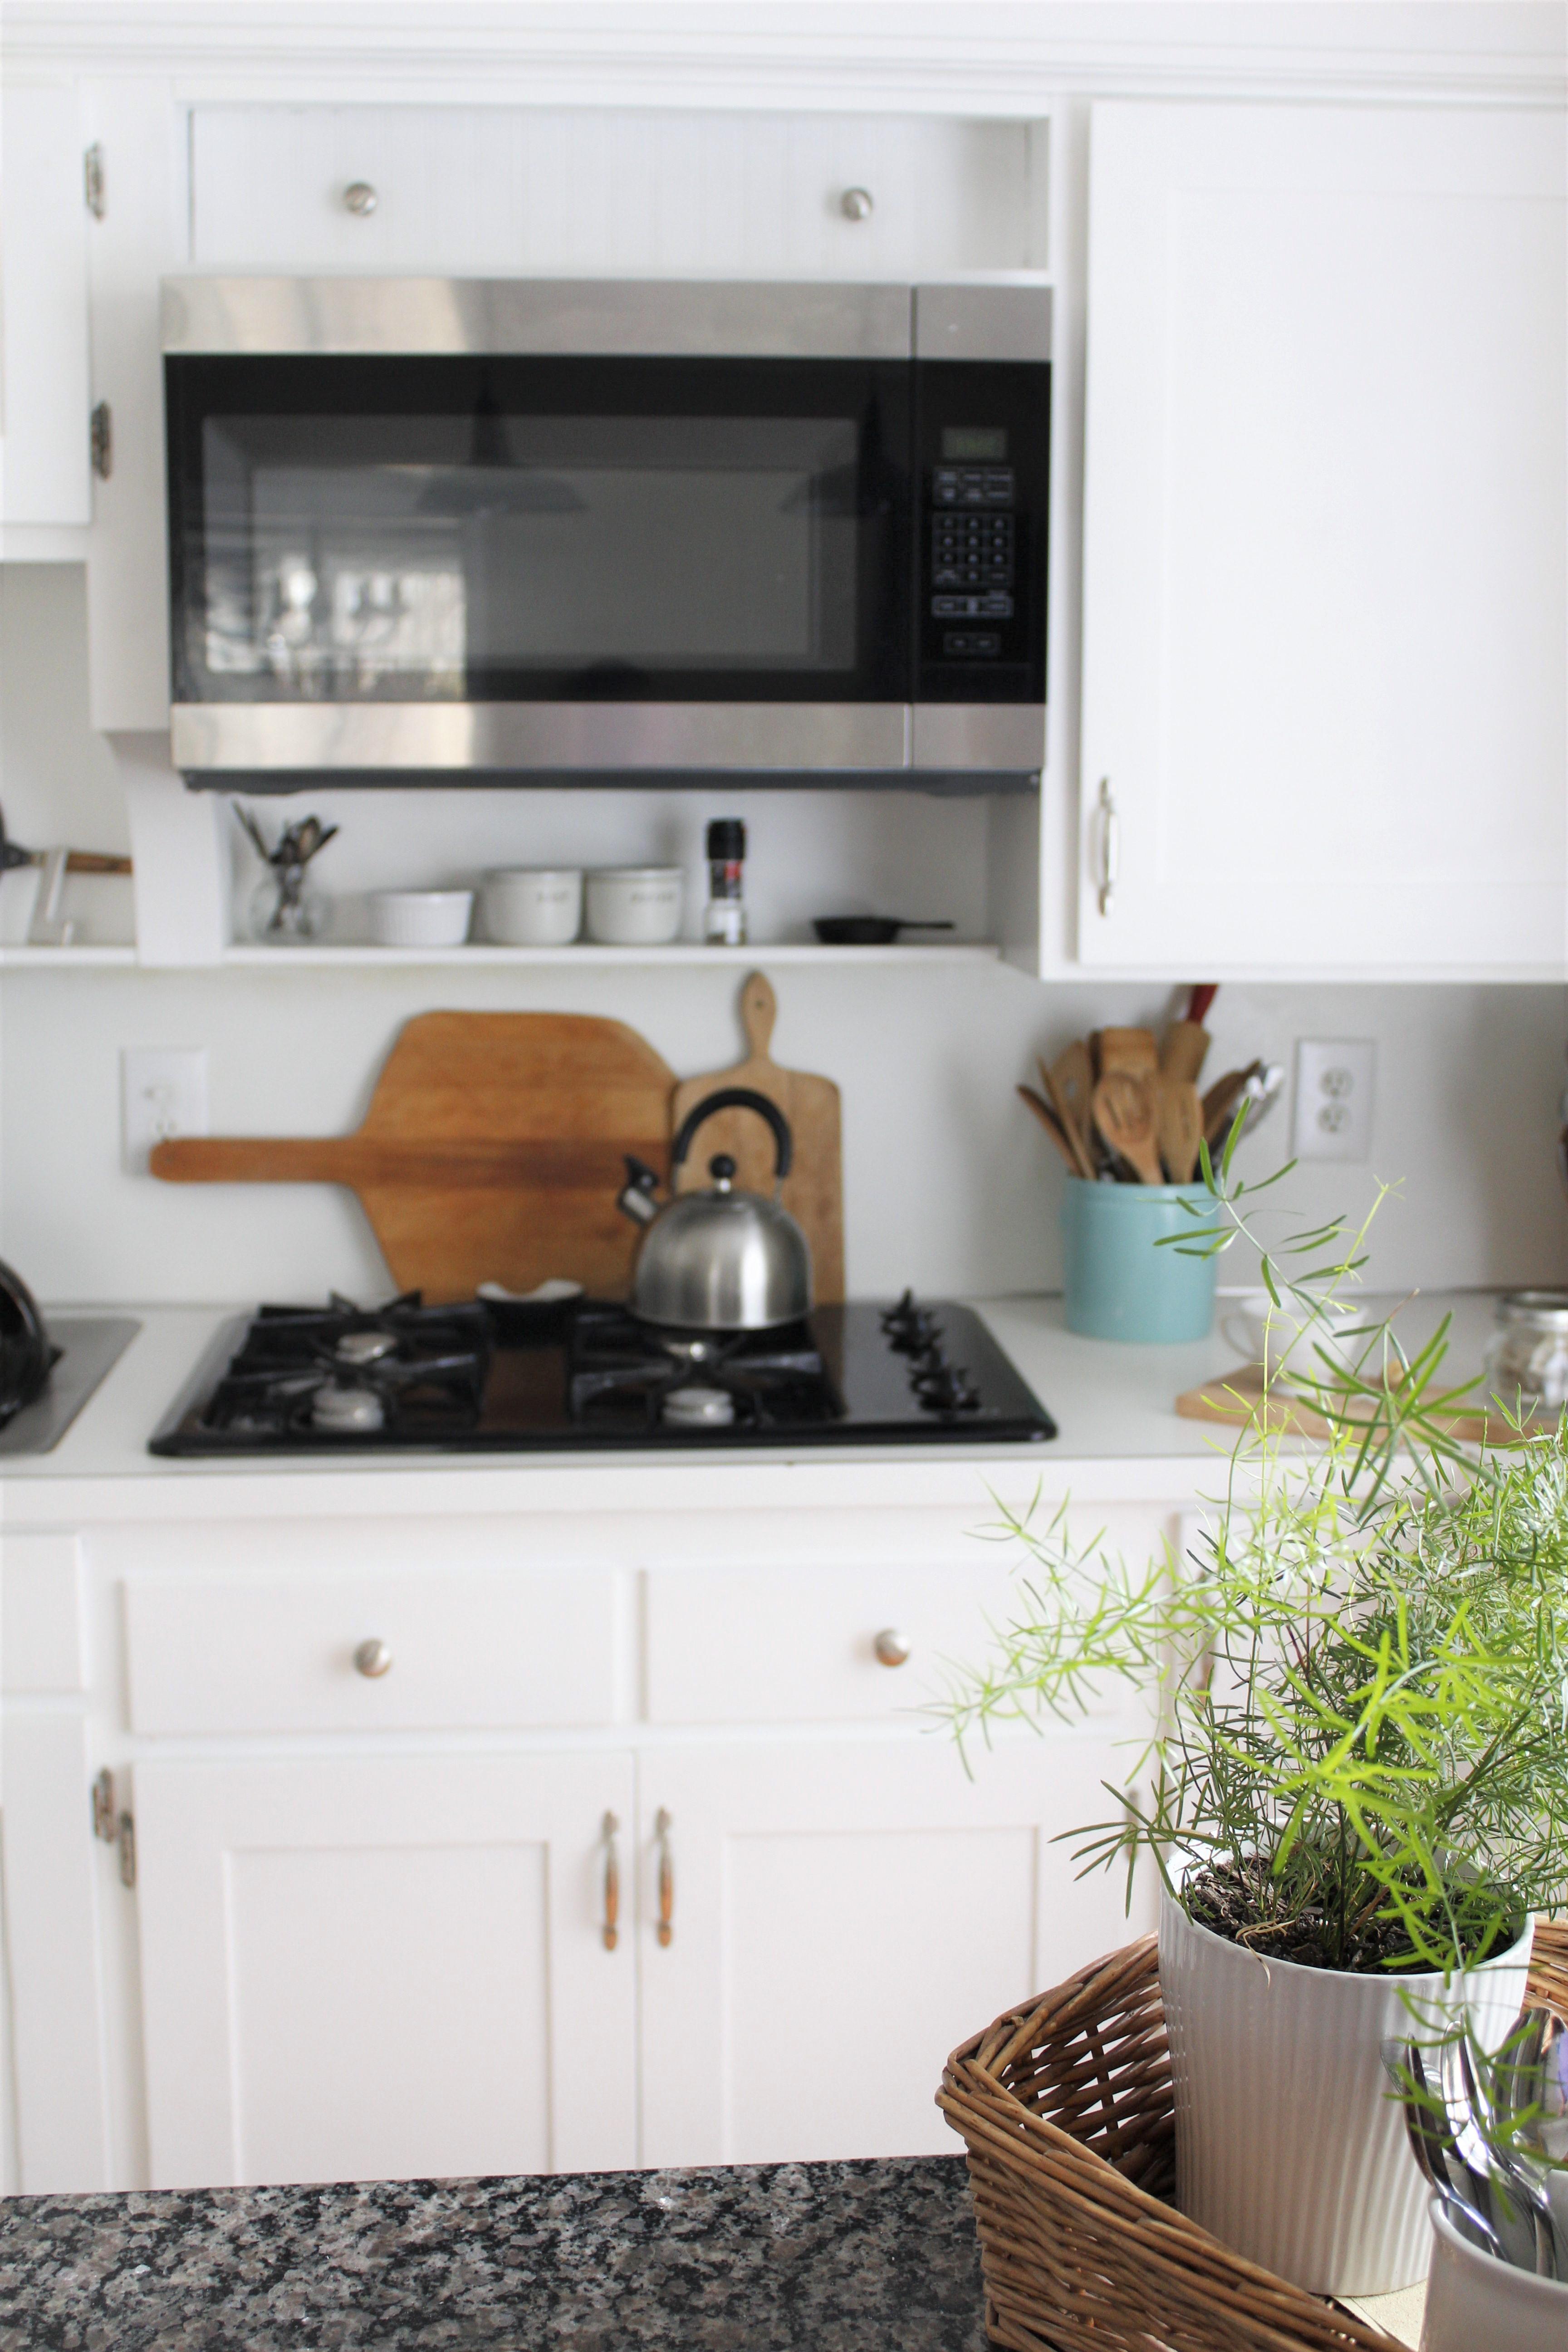 diy guide to refacing kitchen cabinets. Black Bedroom Furniture Sets. Home Design Ideas